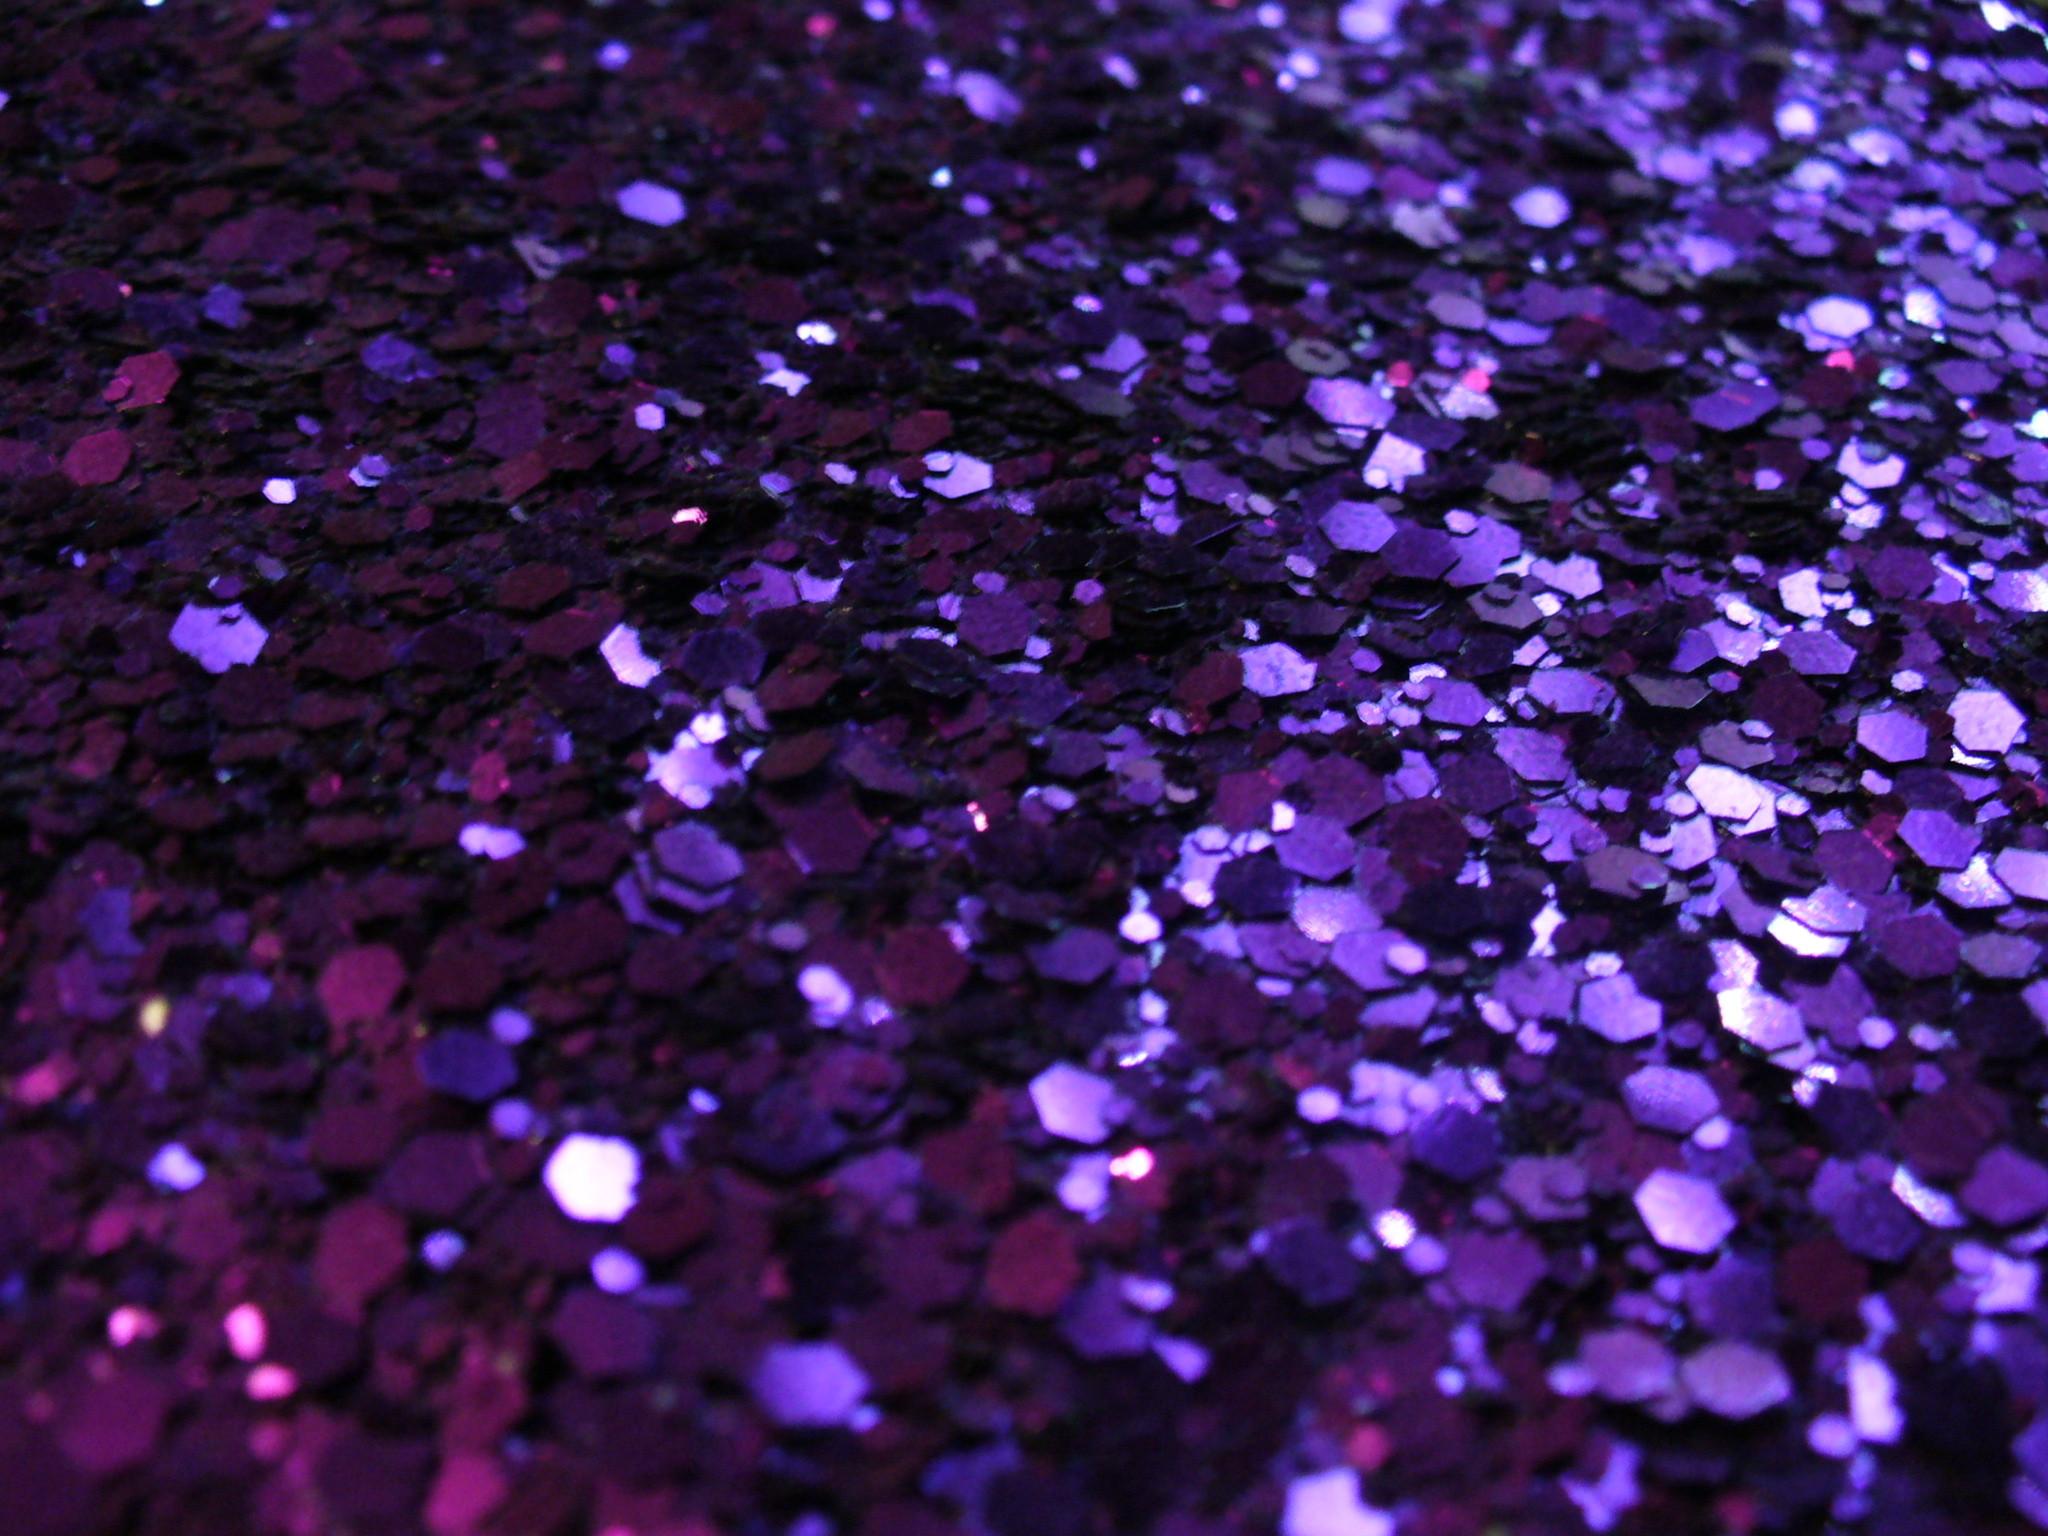 Purple · Gold Sparkly HD Picture Wallpaper » …